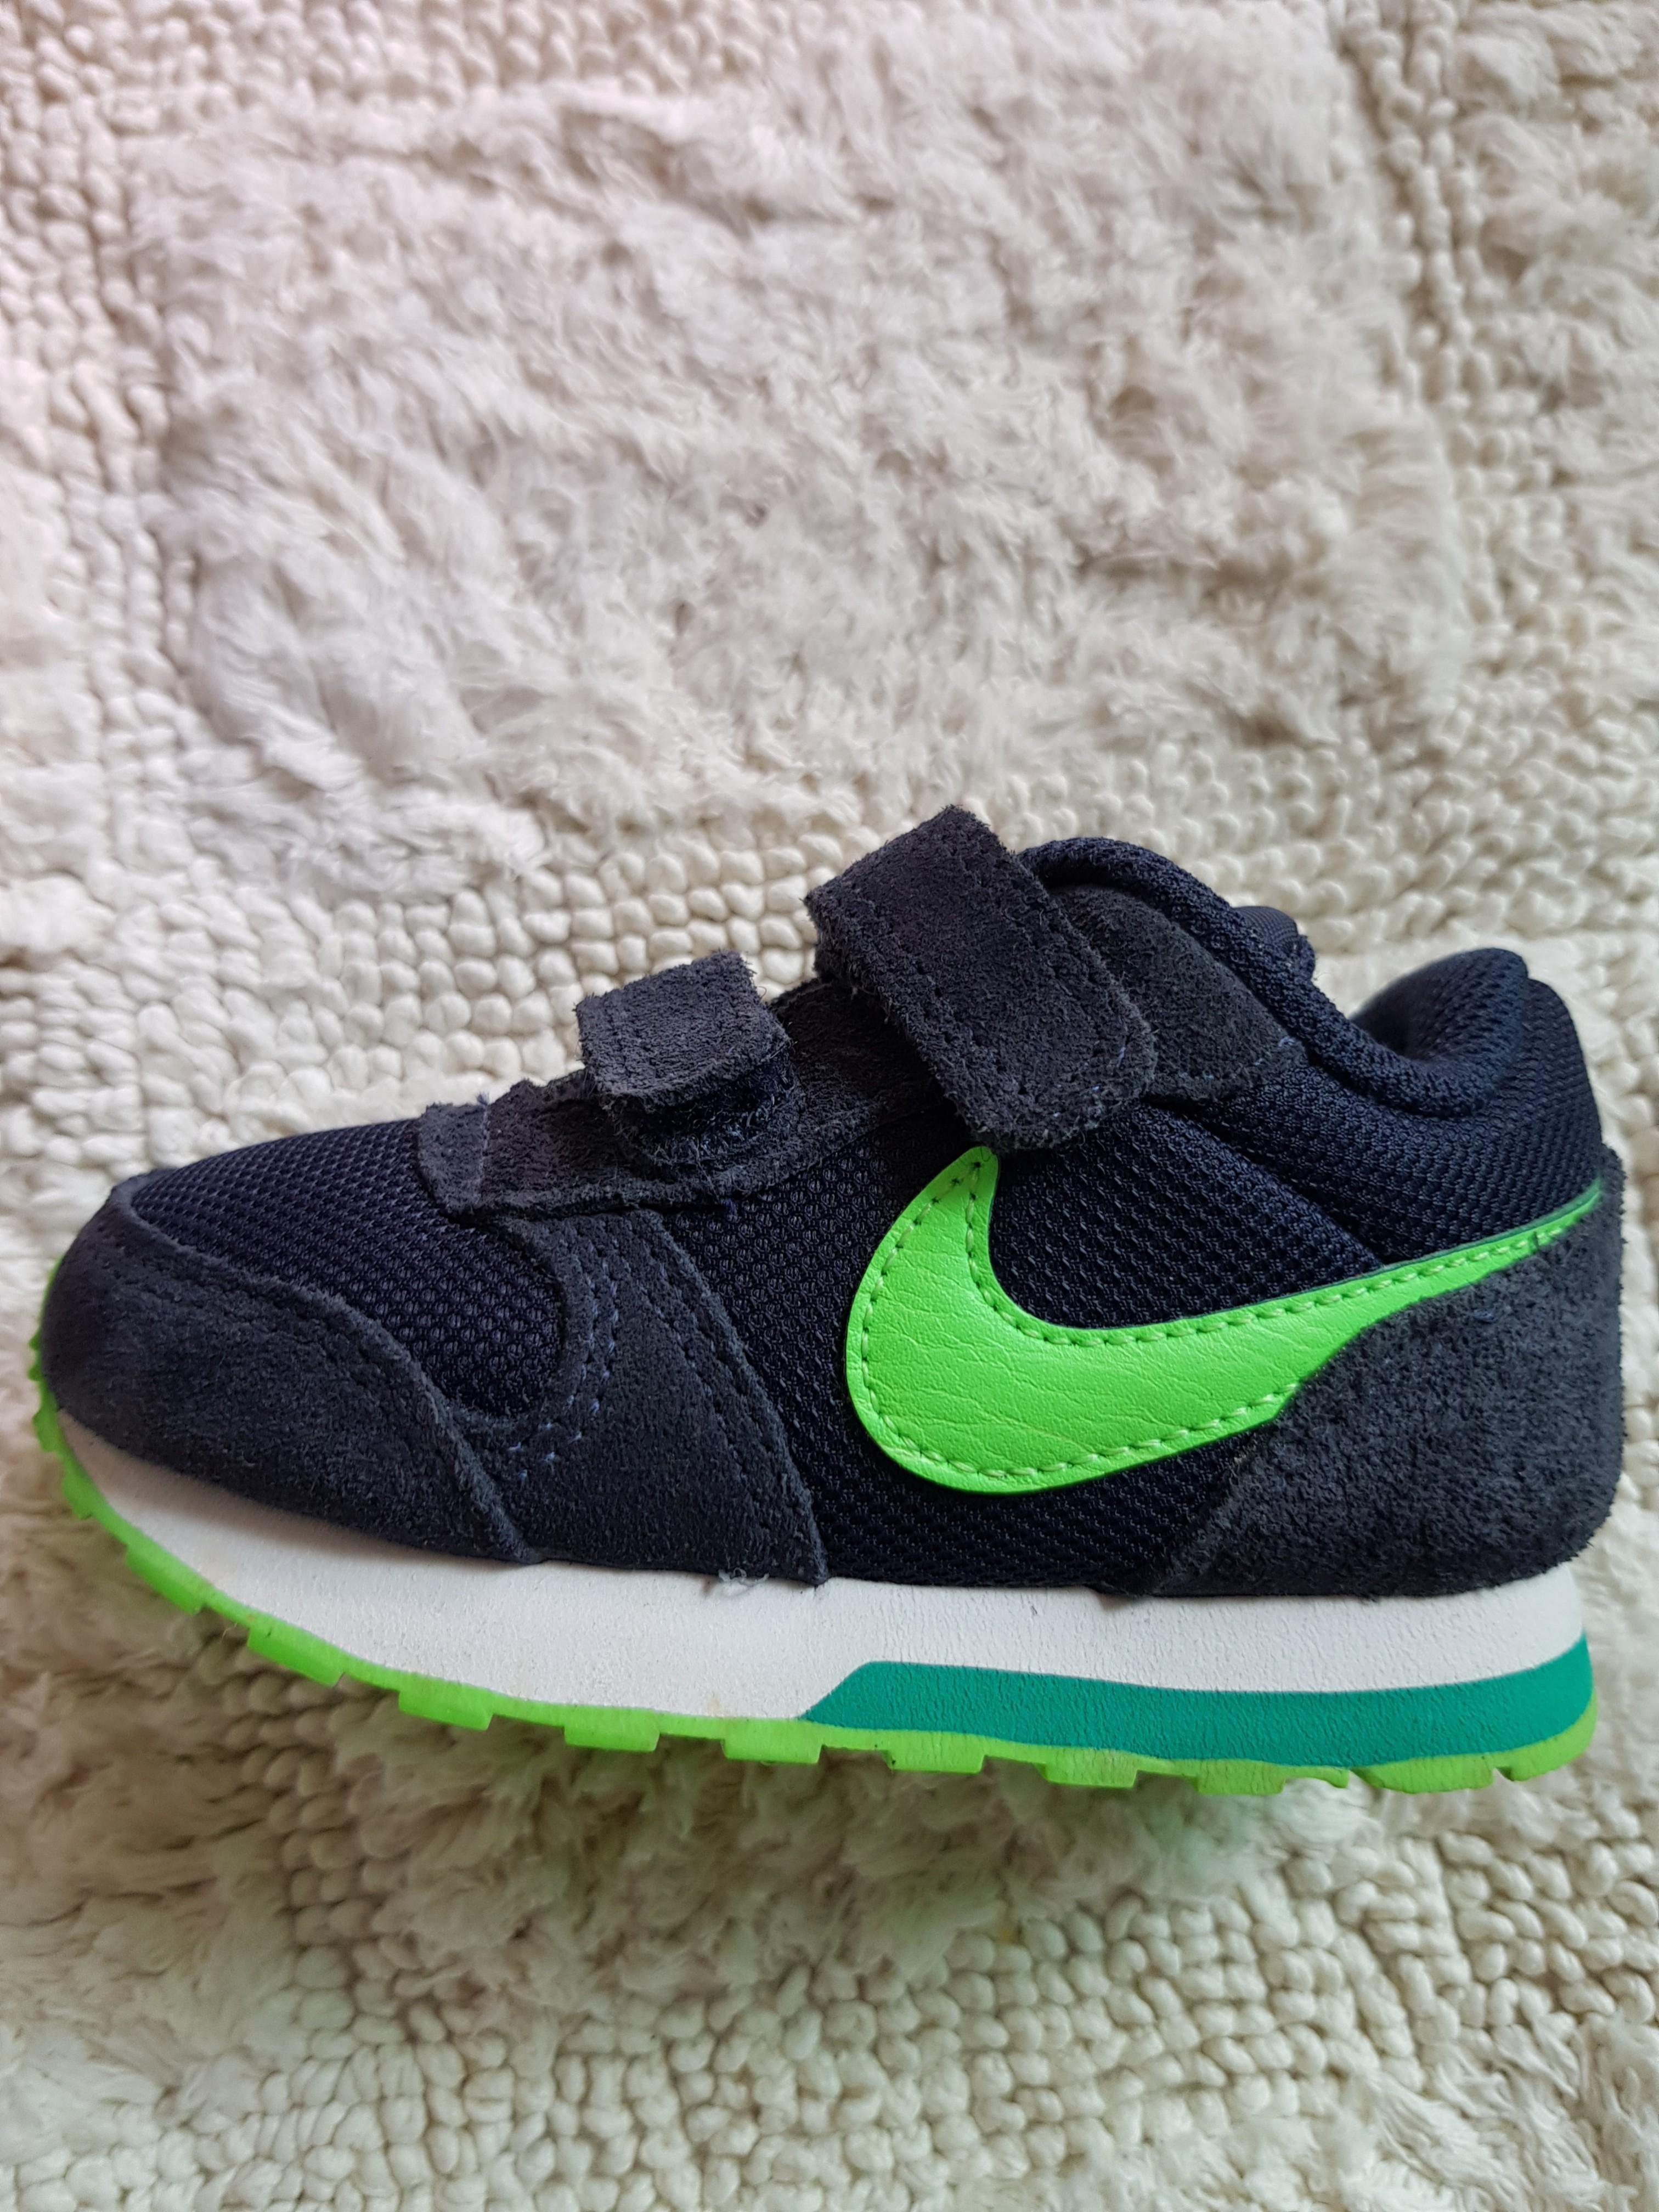 Like New* Nike Toddler Boy Shoes